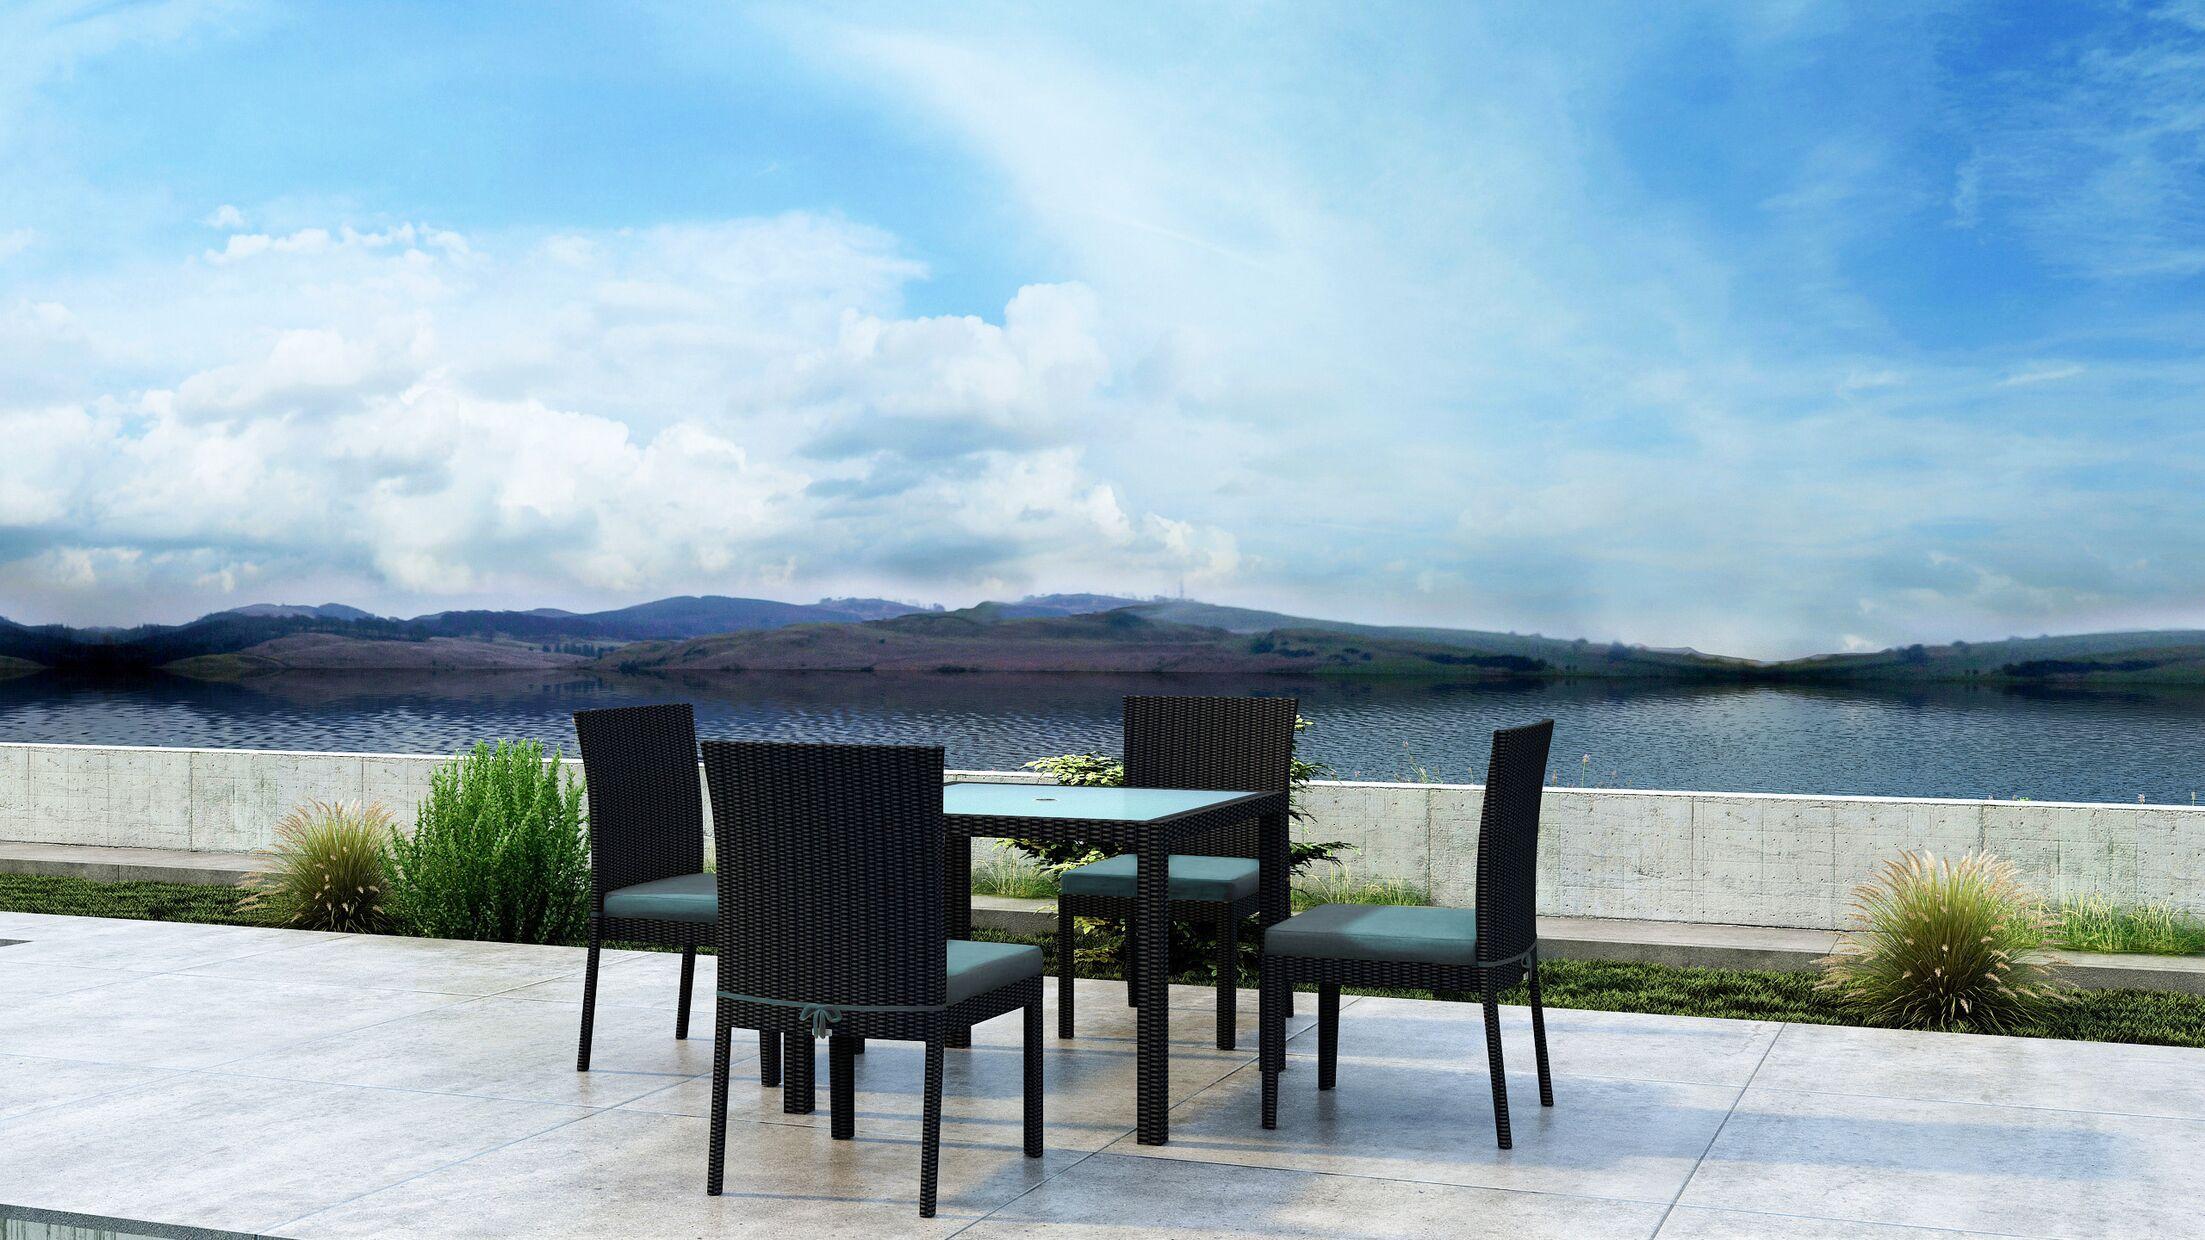 Glendale 5 Piece Dining Set with Sunbrella Cushion Cushion Color: Cast Lagoon